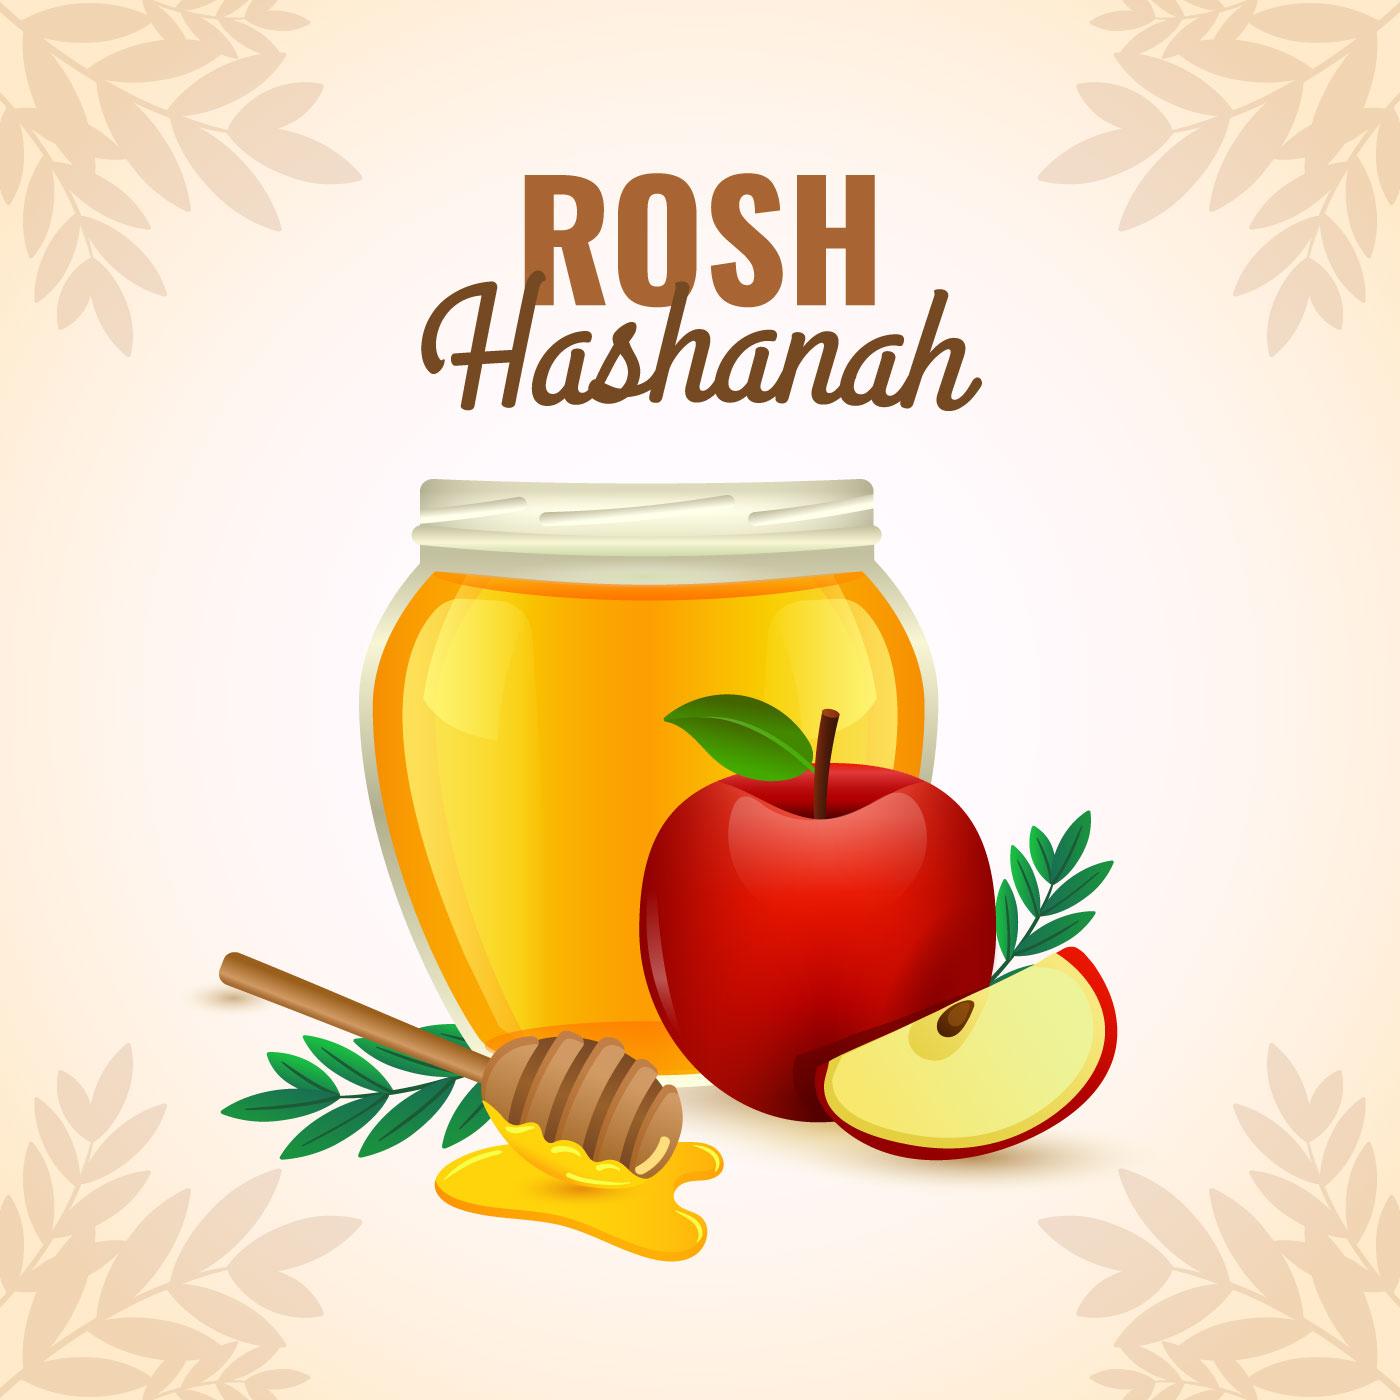 Rosh Hashanah Apple And Honey Download Free Vector Art Stock